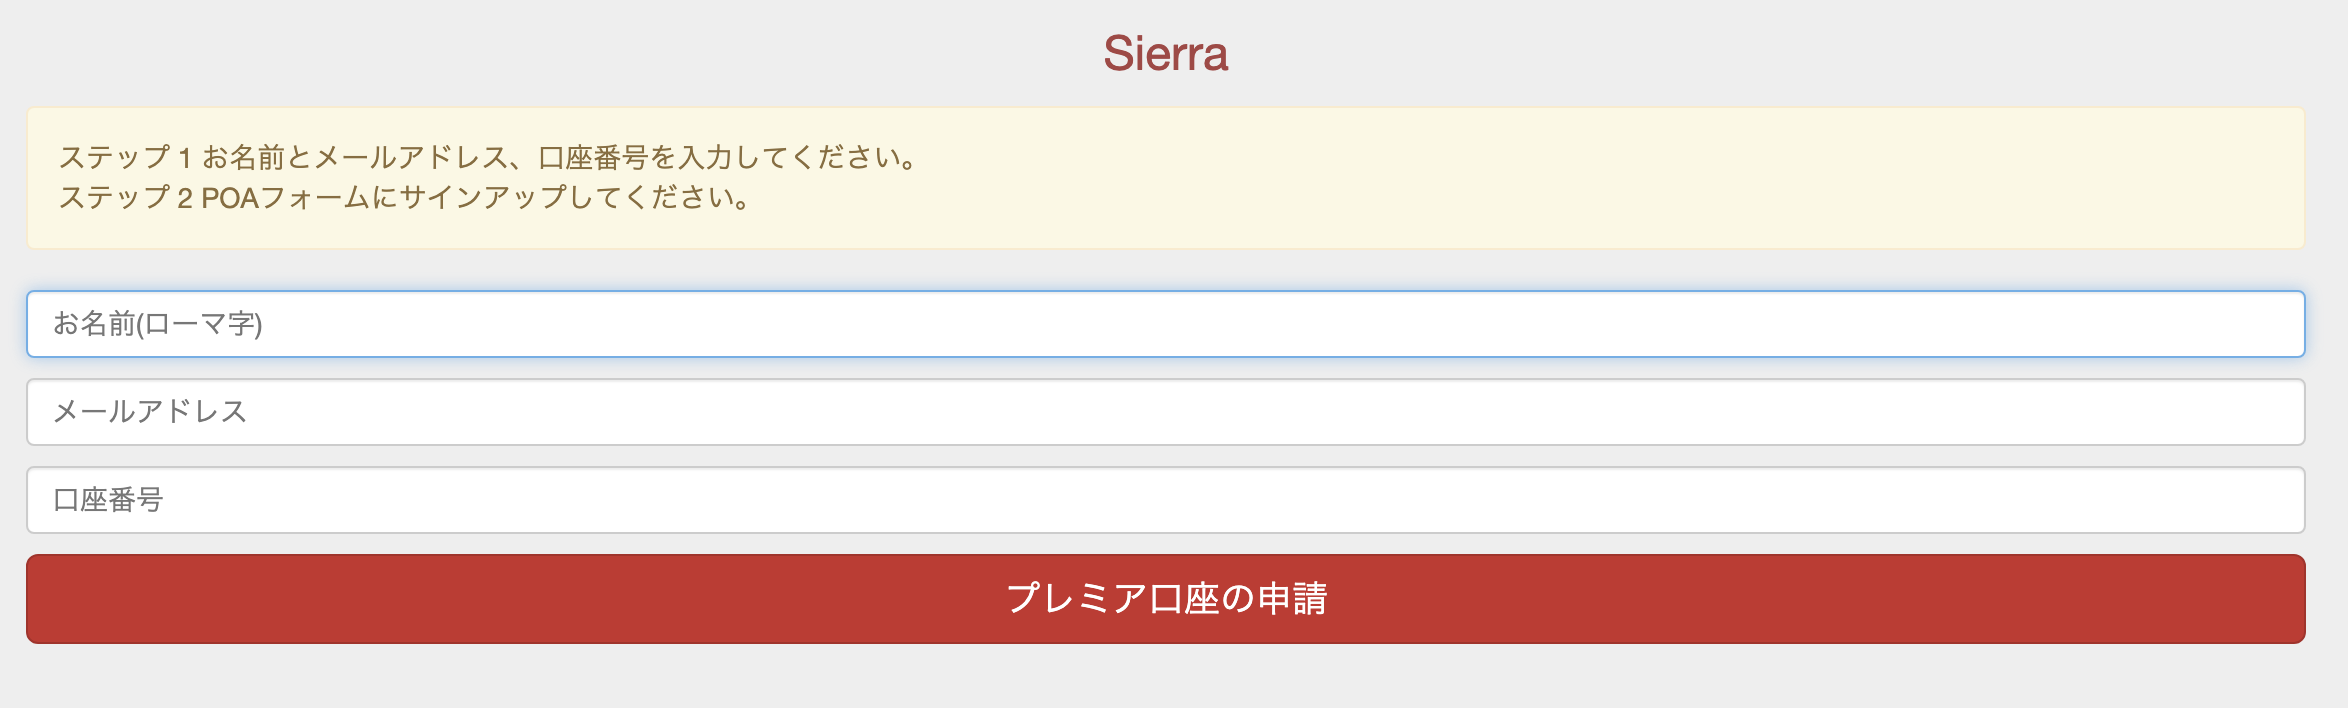 Sierraシステムの連携必要情報